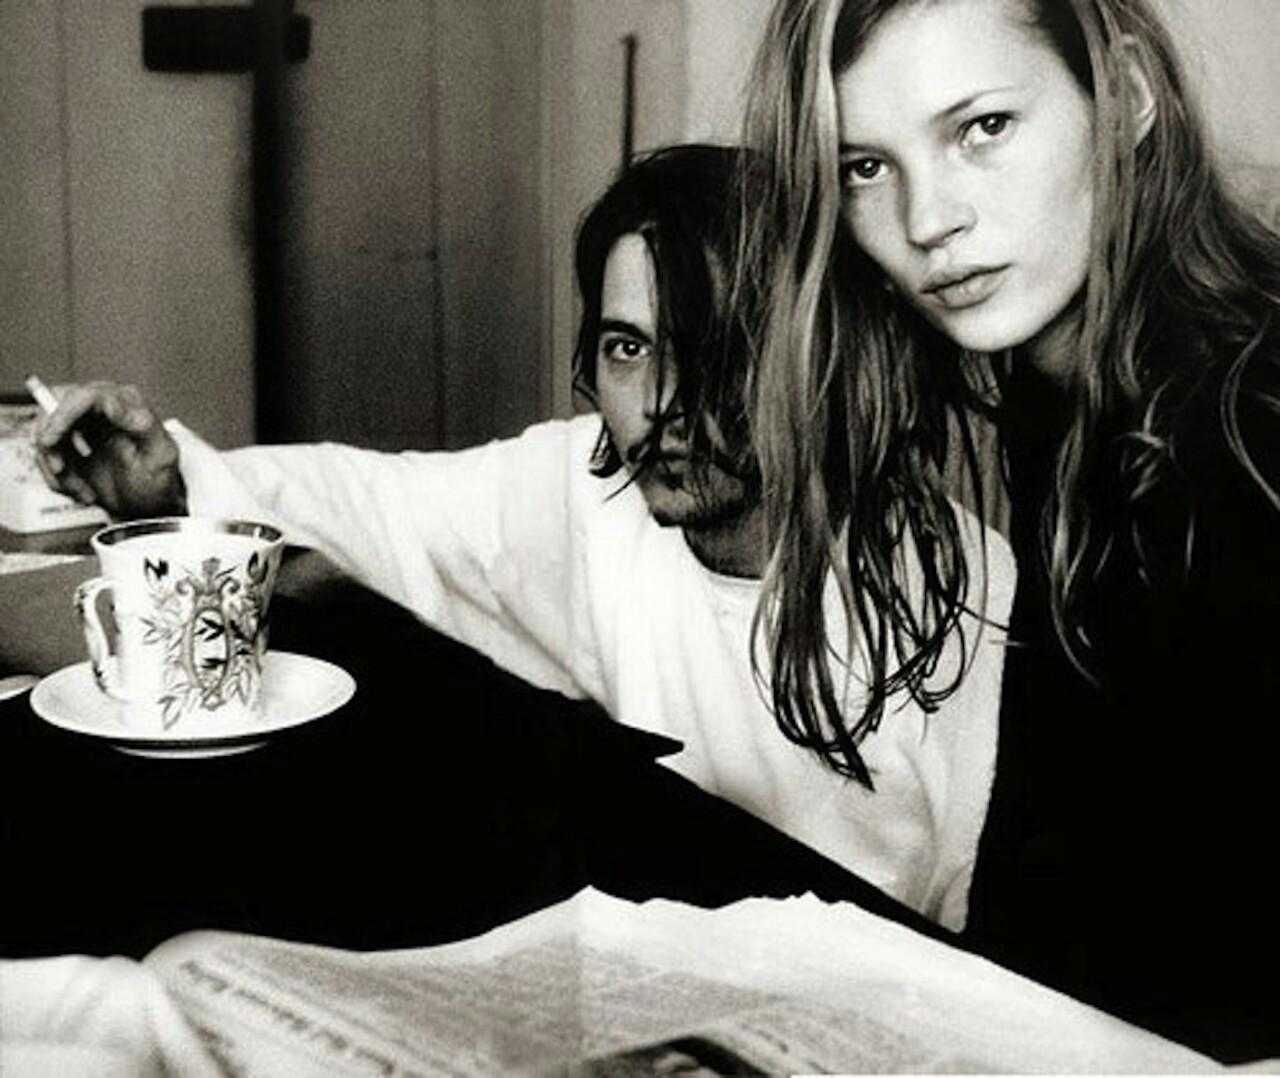 Джонни Депп и Кейт Мосс 1994